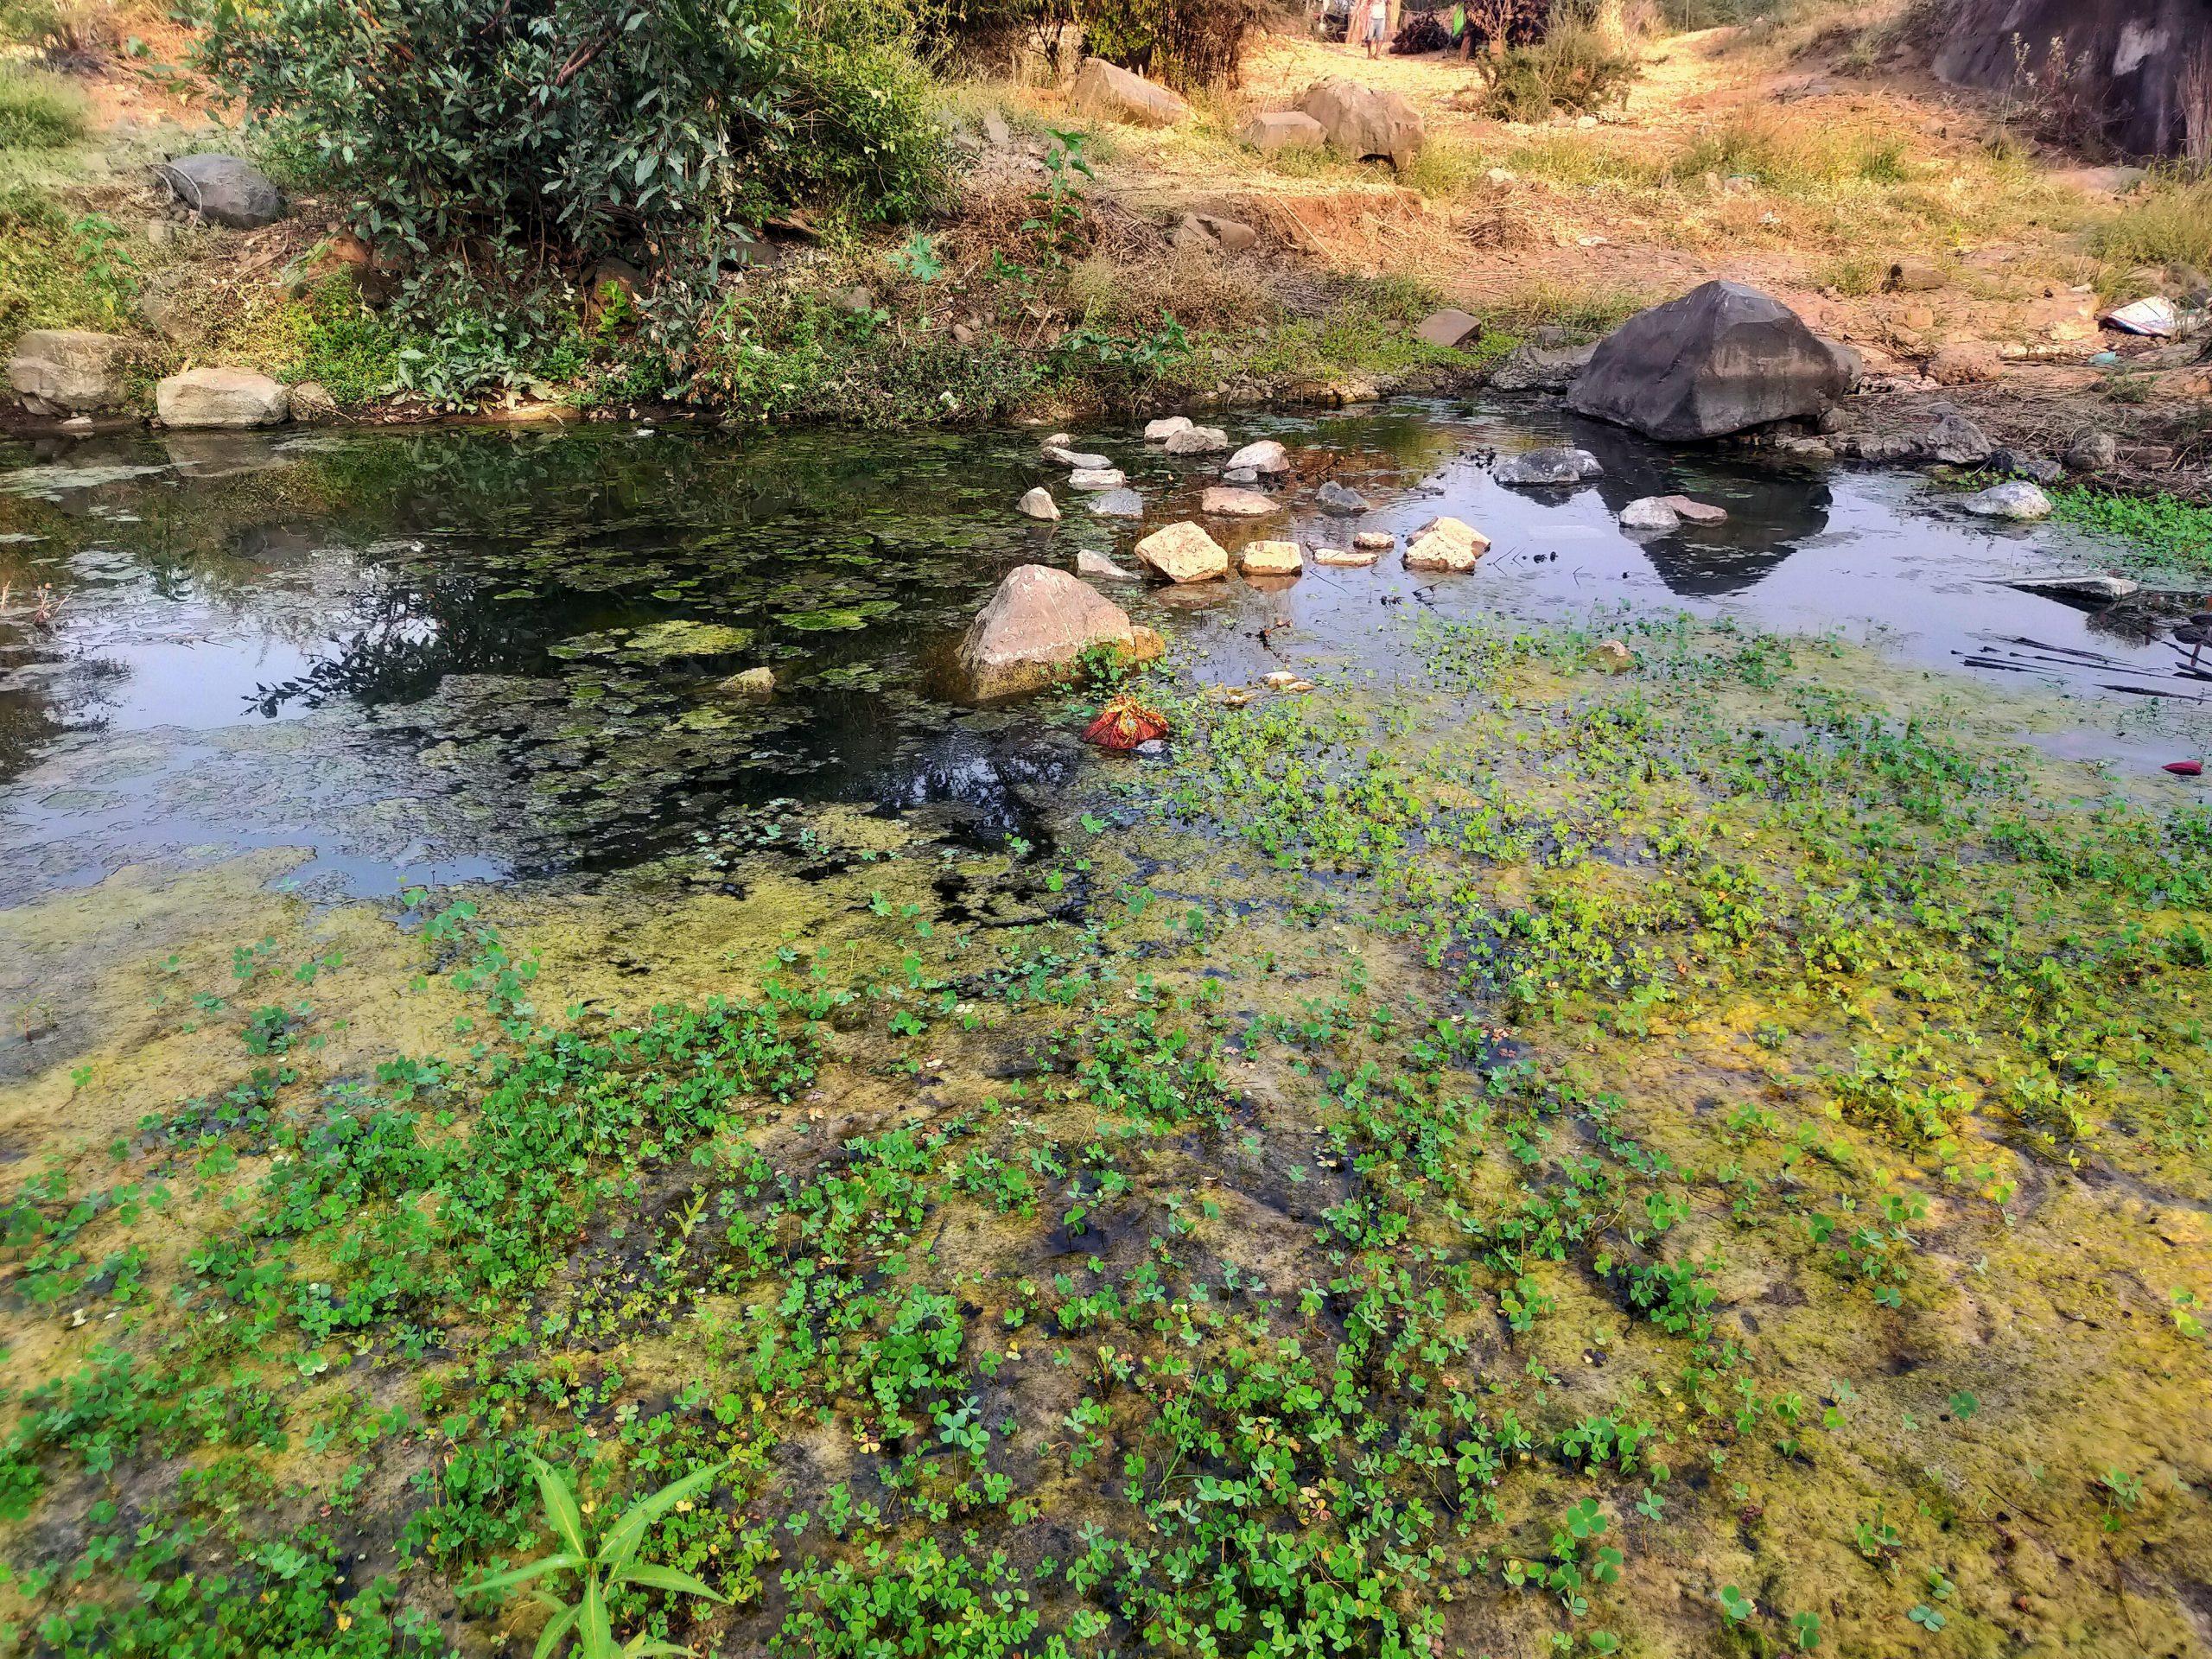 Algae in the water